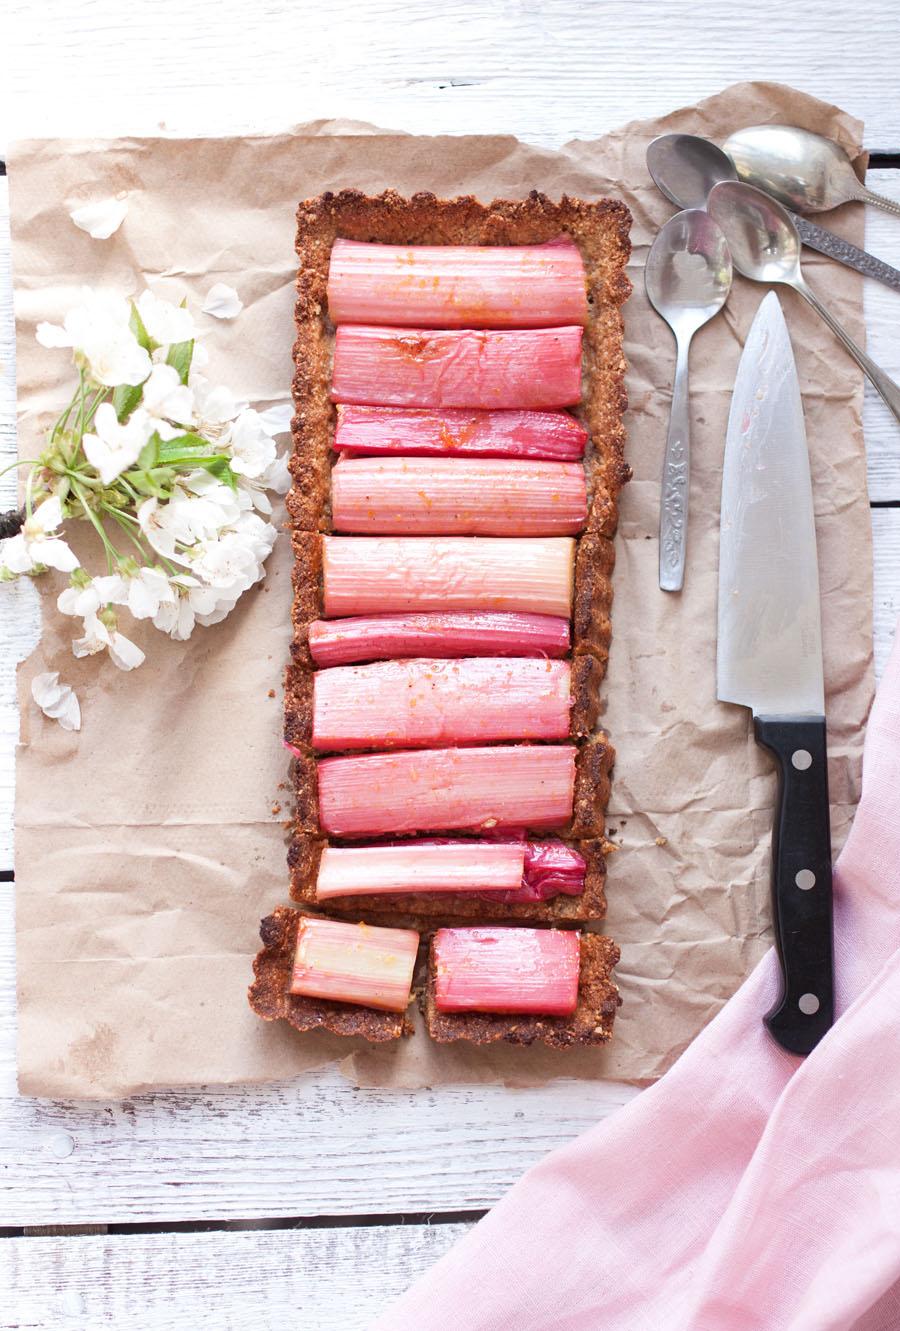 sweet rhubarb tart - The Little Plantation